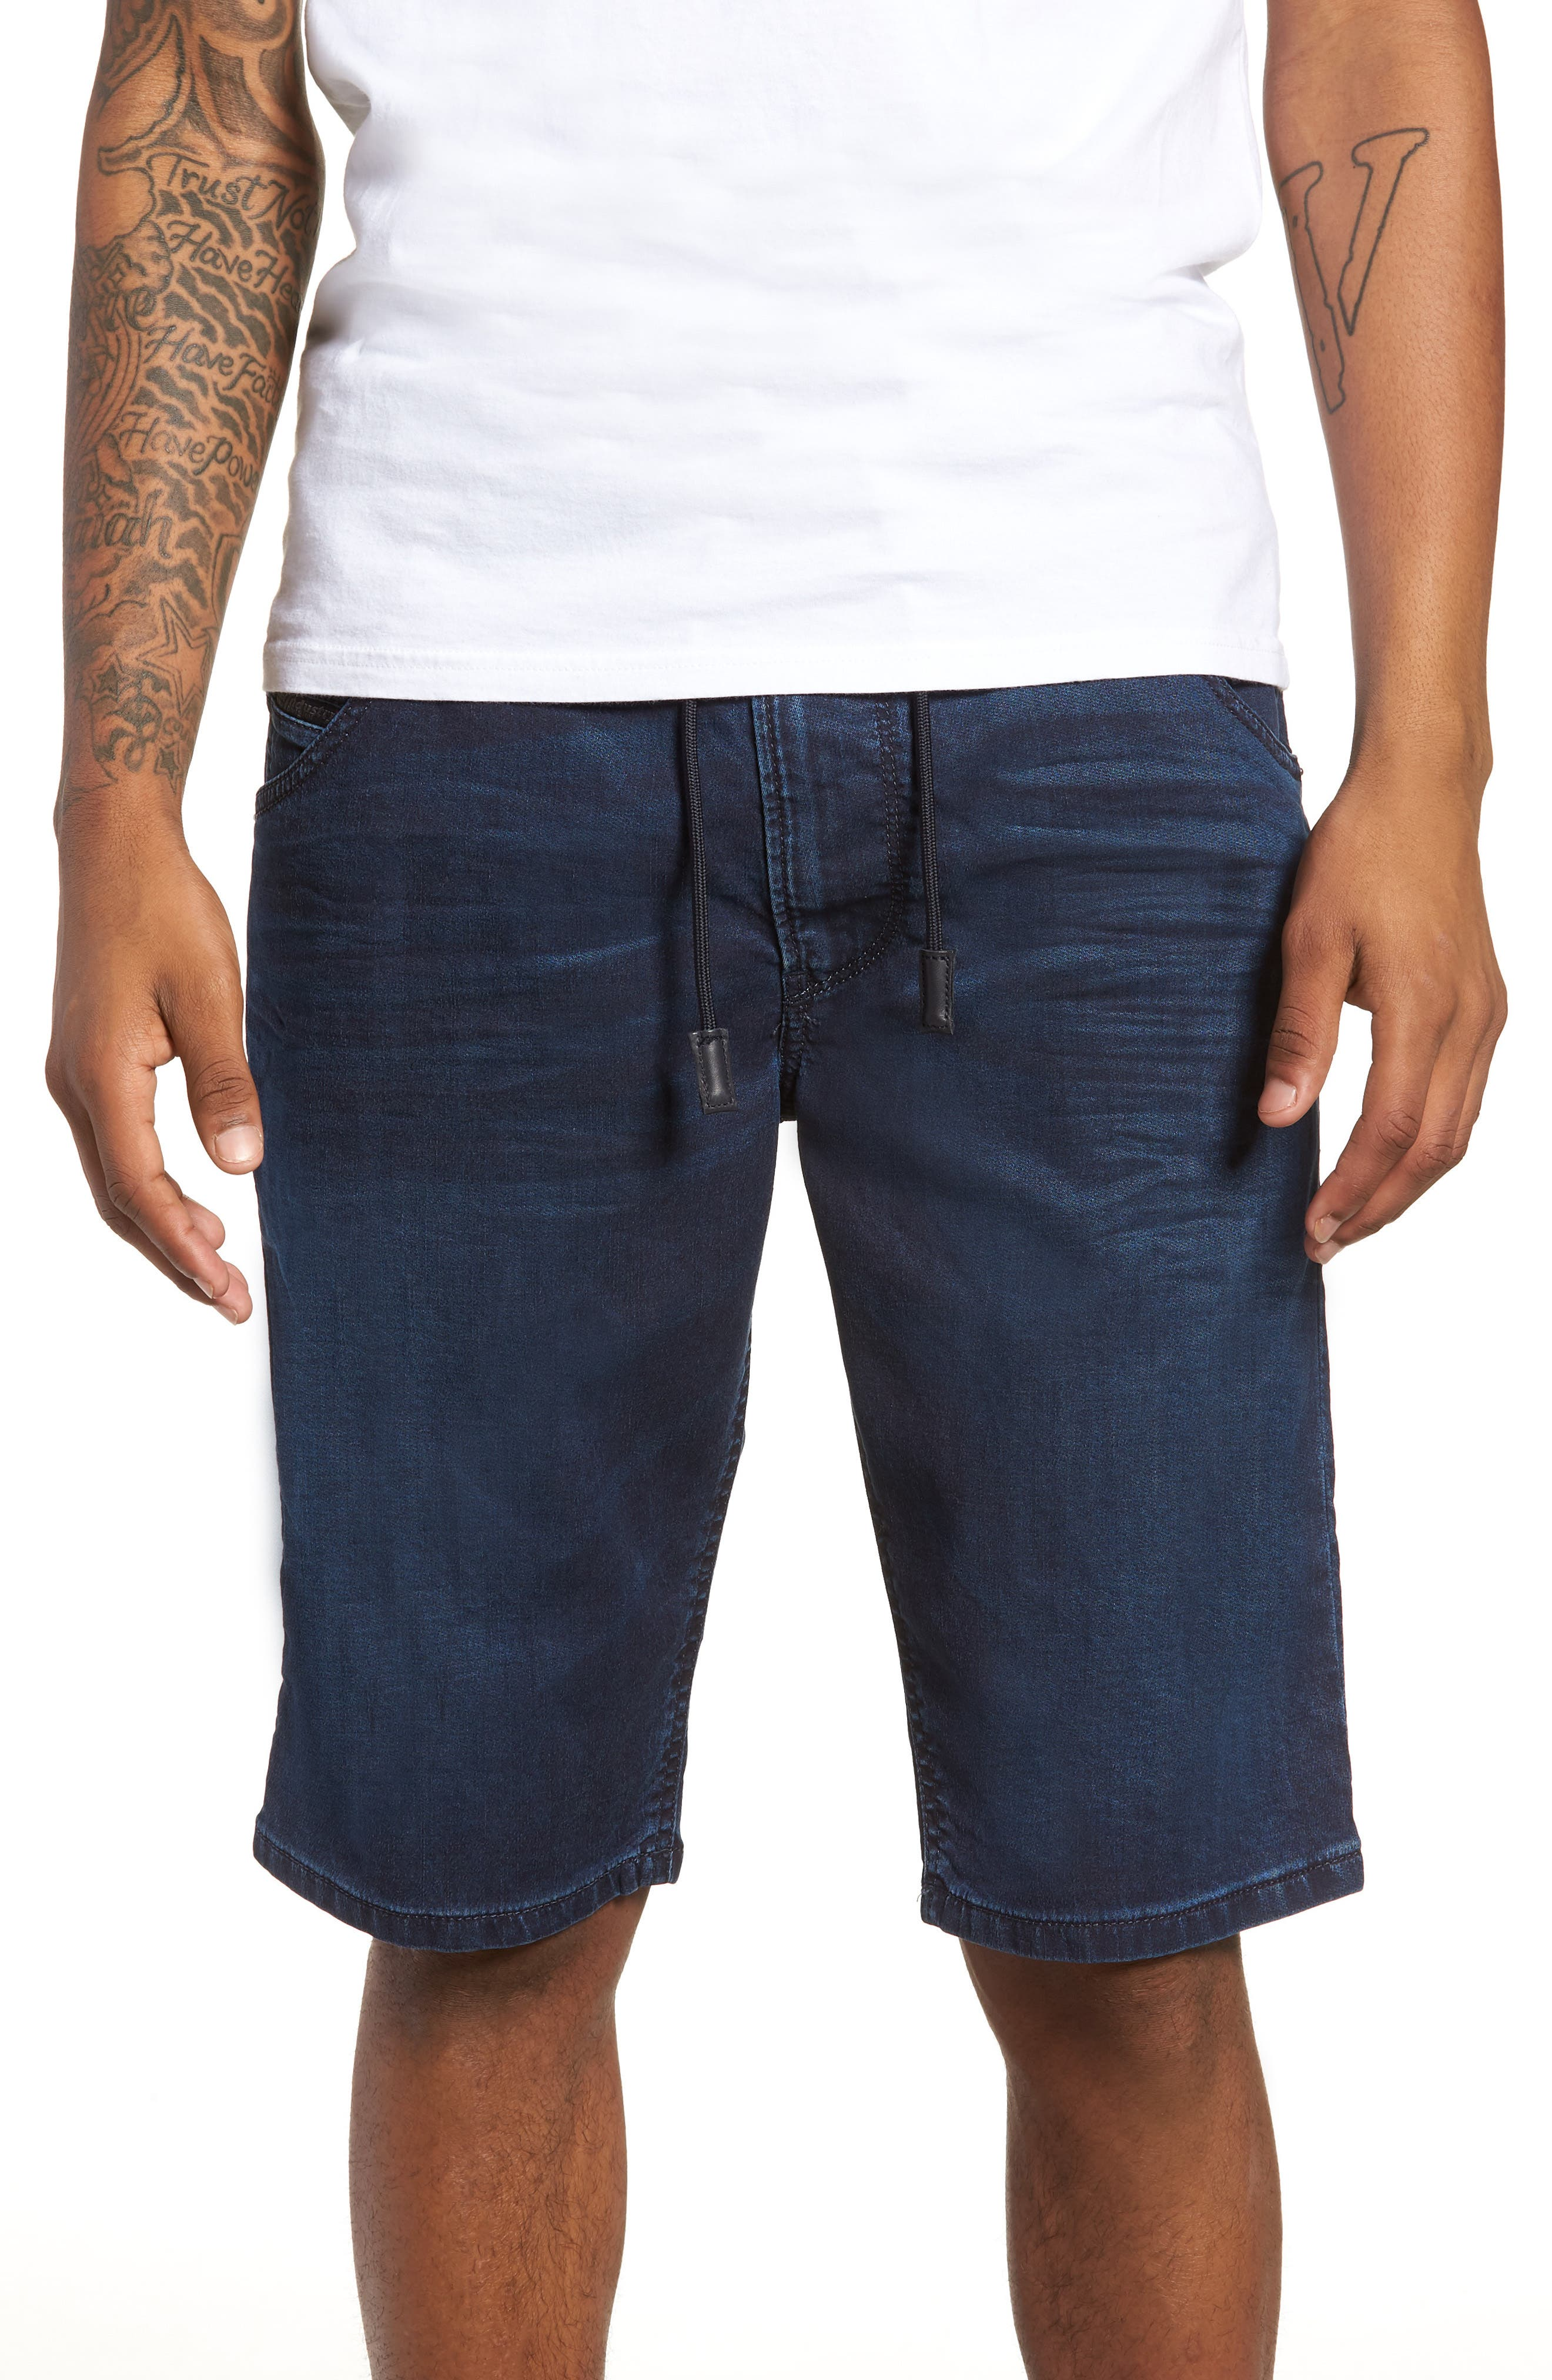 Krooshort Denim Shorts,                             Main thumbnail 1, color,                             0699C